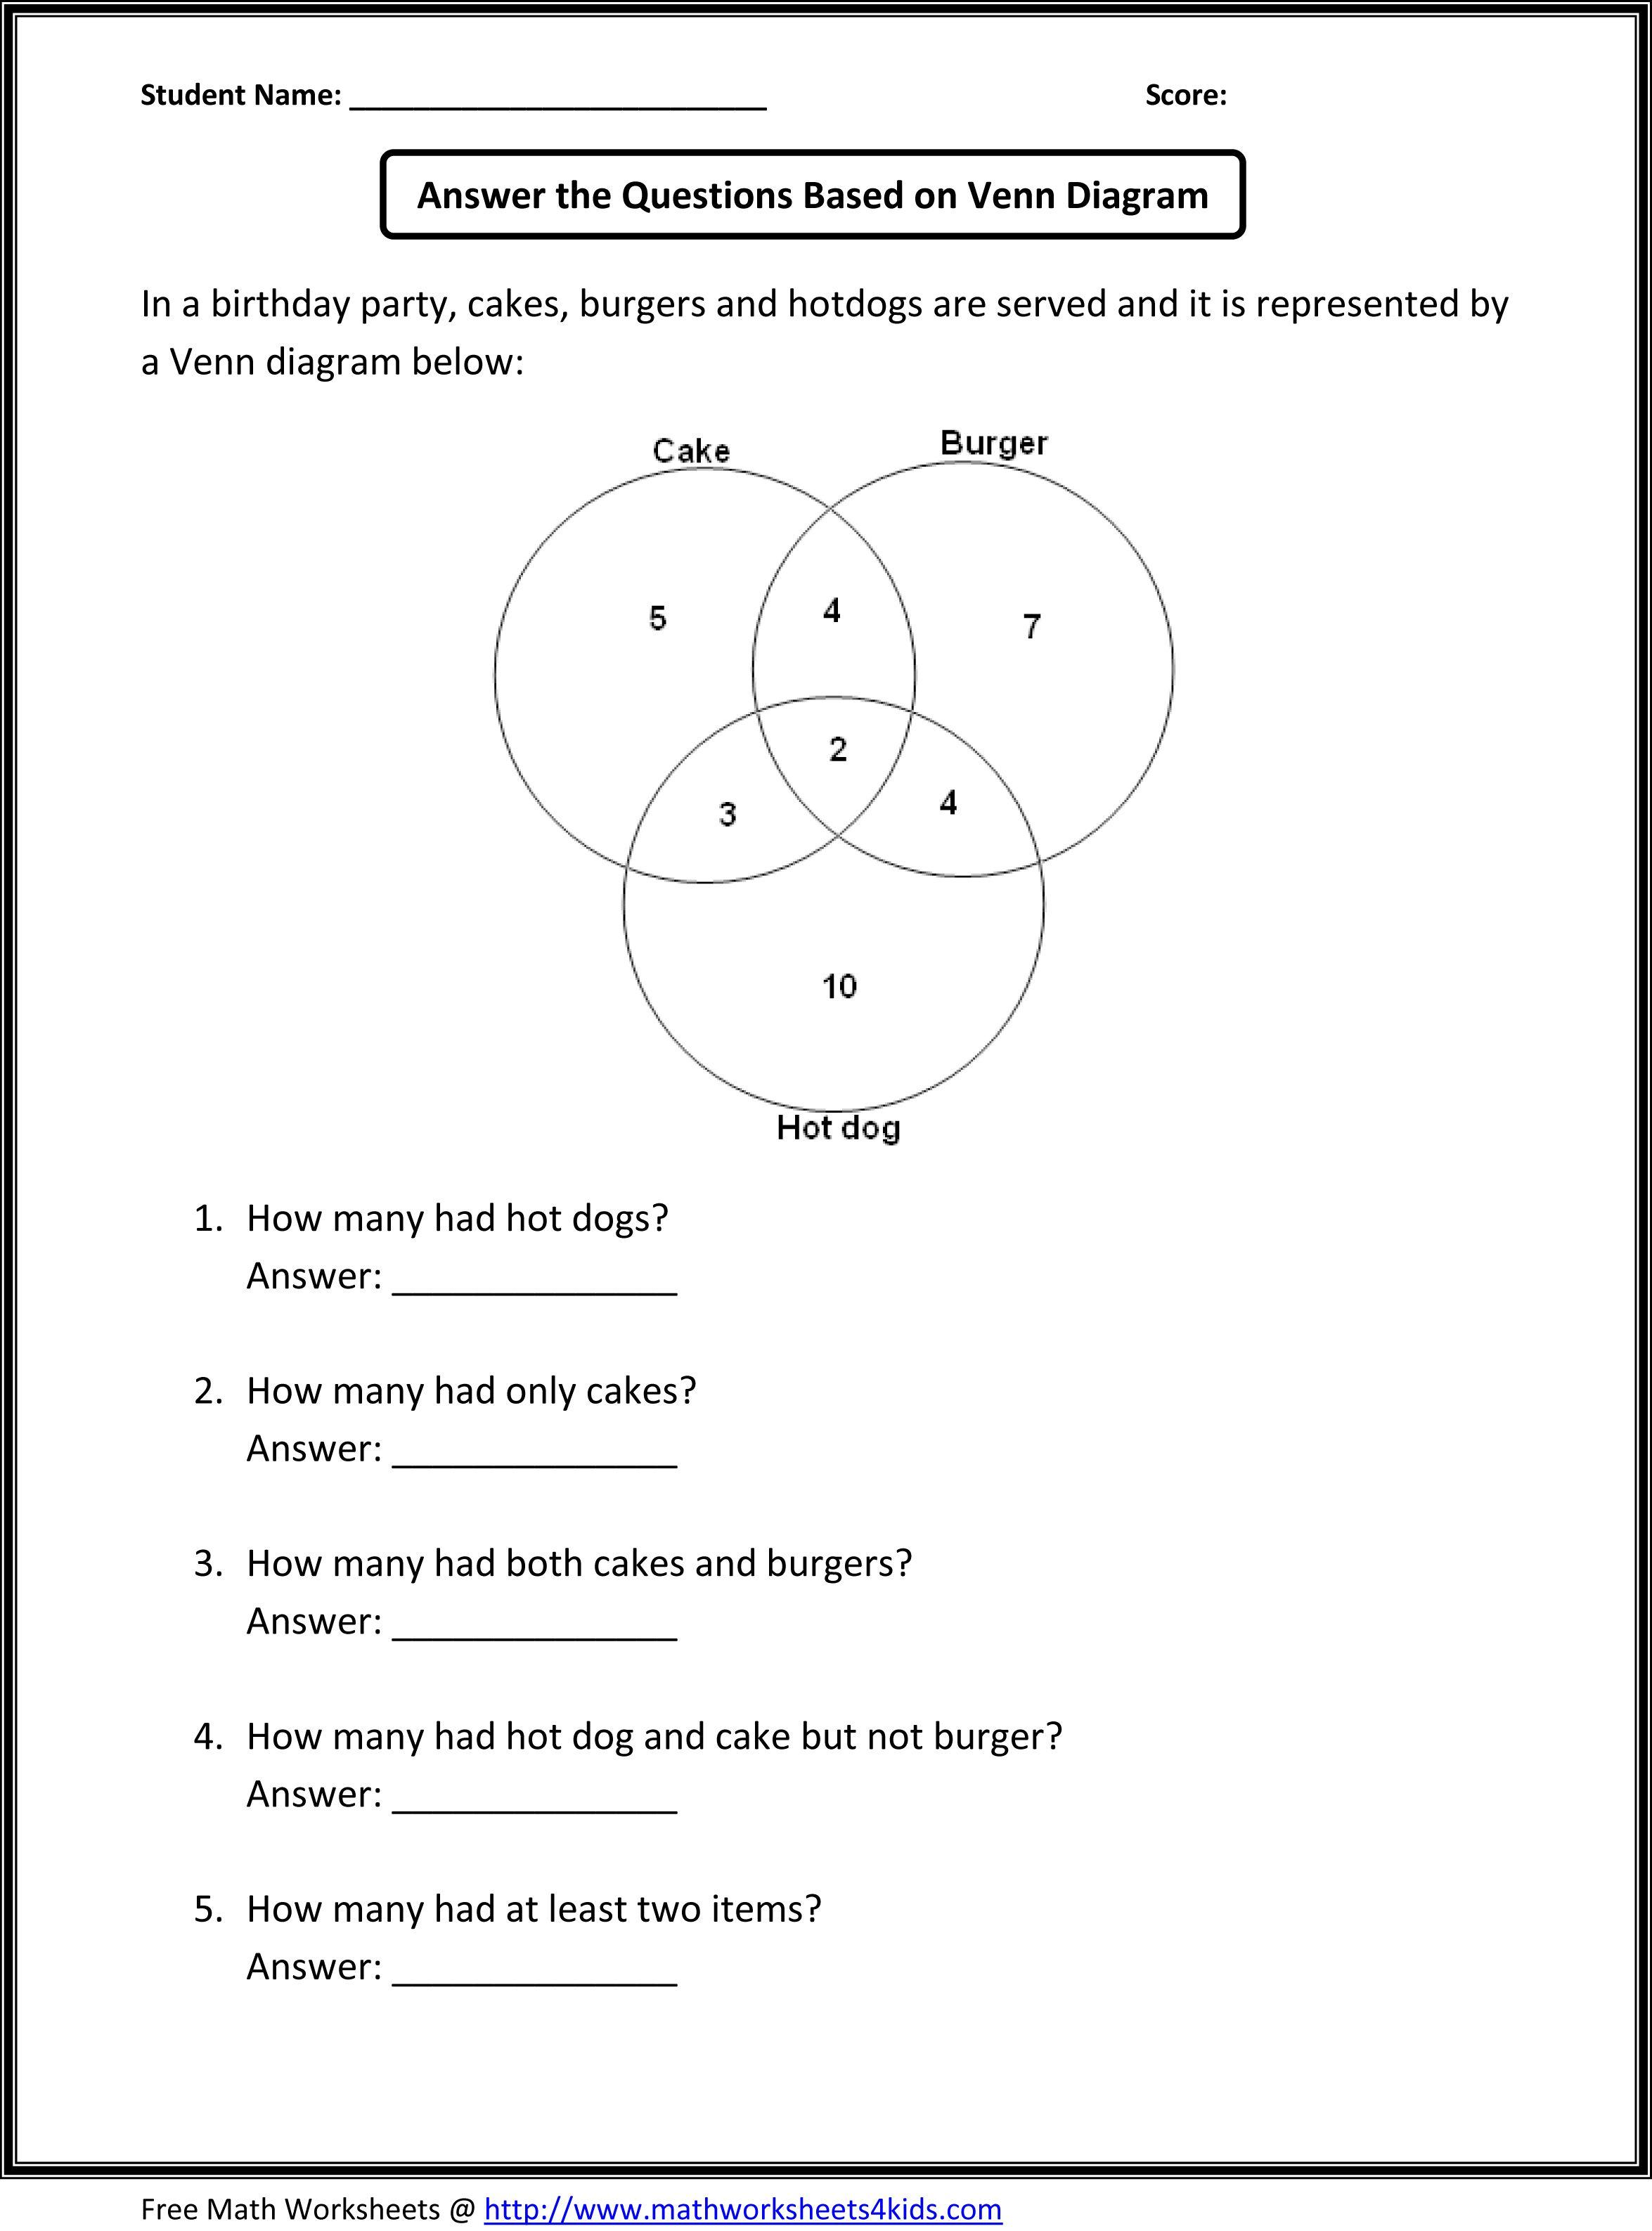 medium resolution of Fifth Grade Math Worksheets   Math worksheets